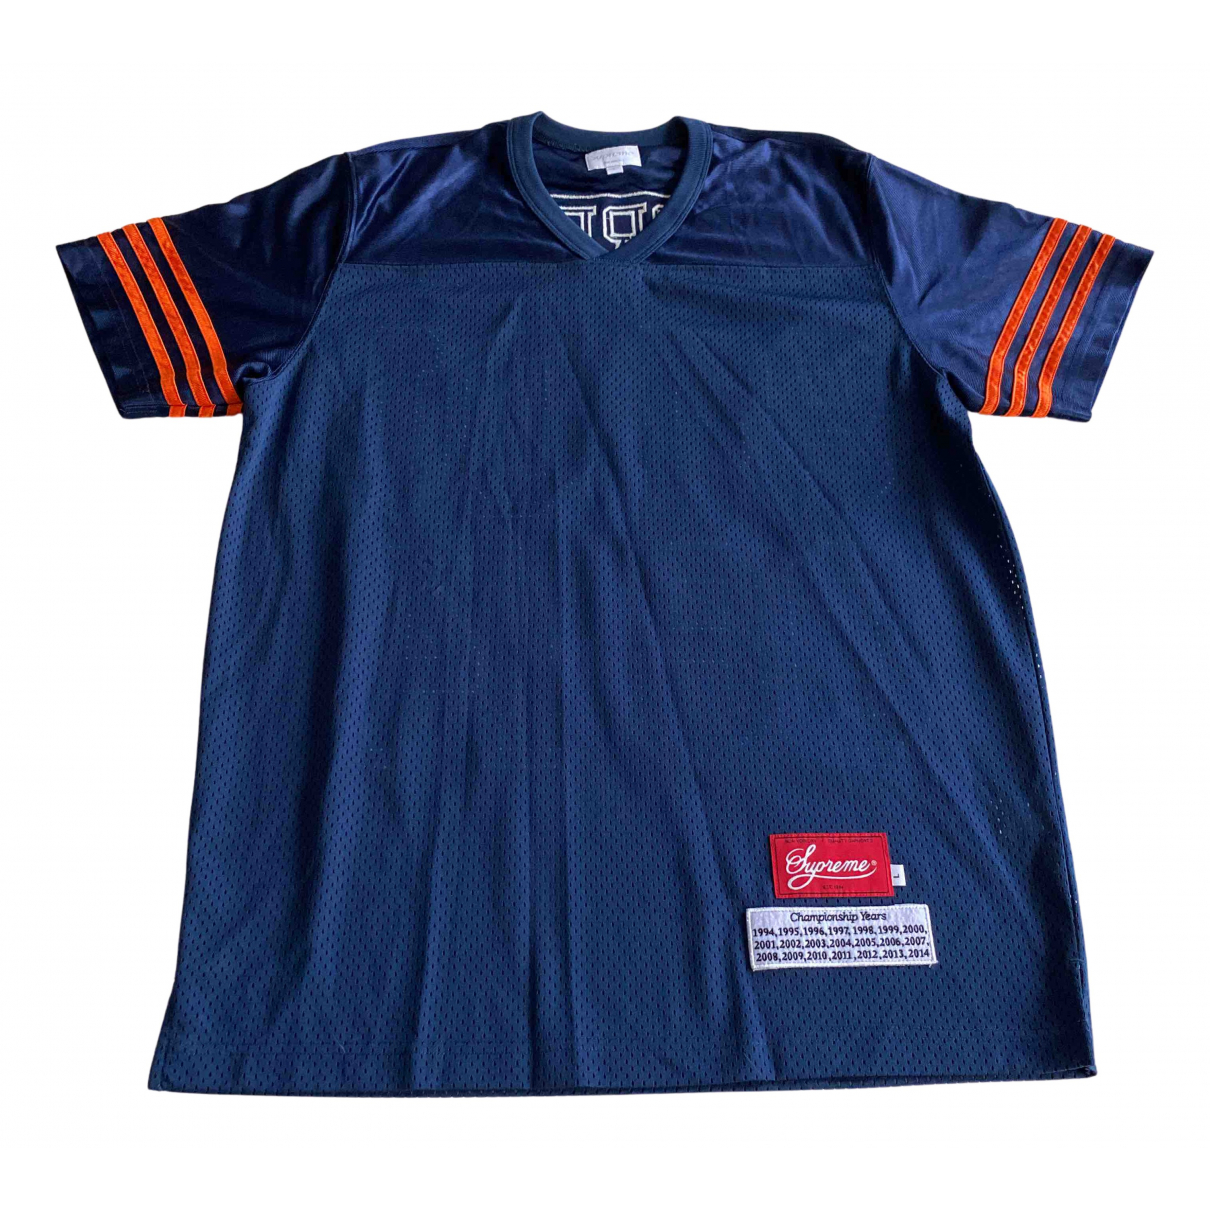 Supreme - Tee shirts   pour homme - bleu